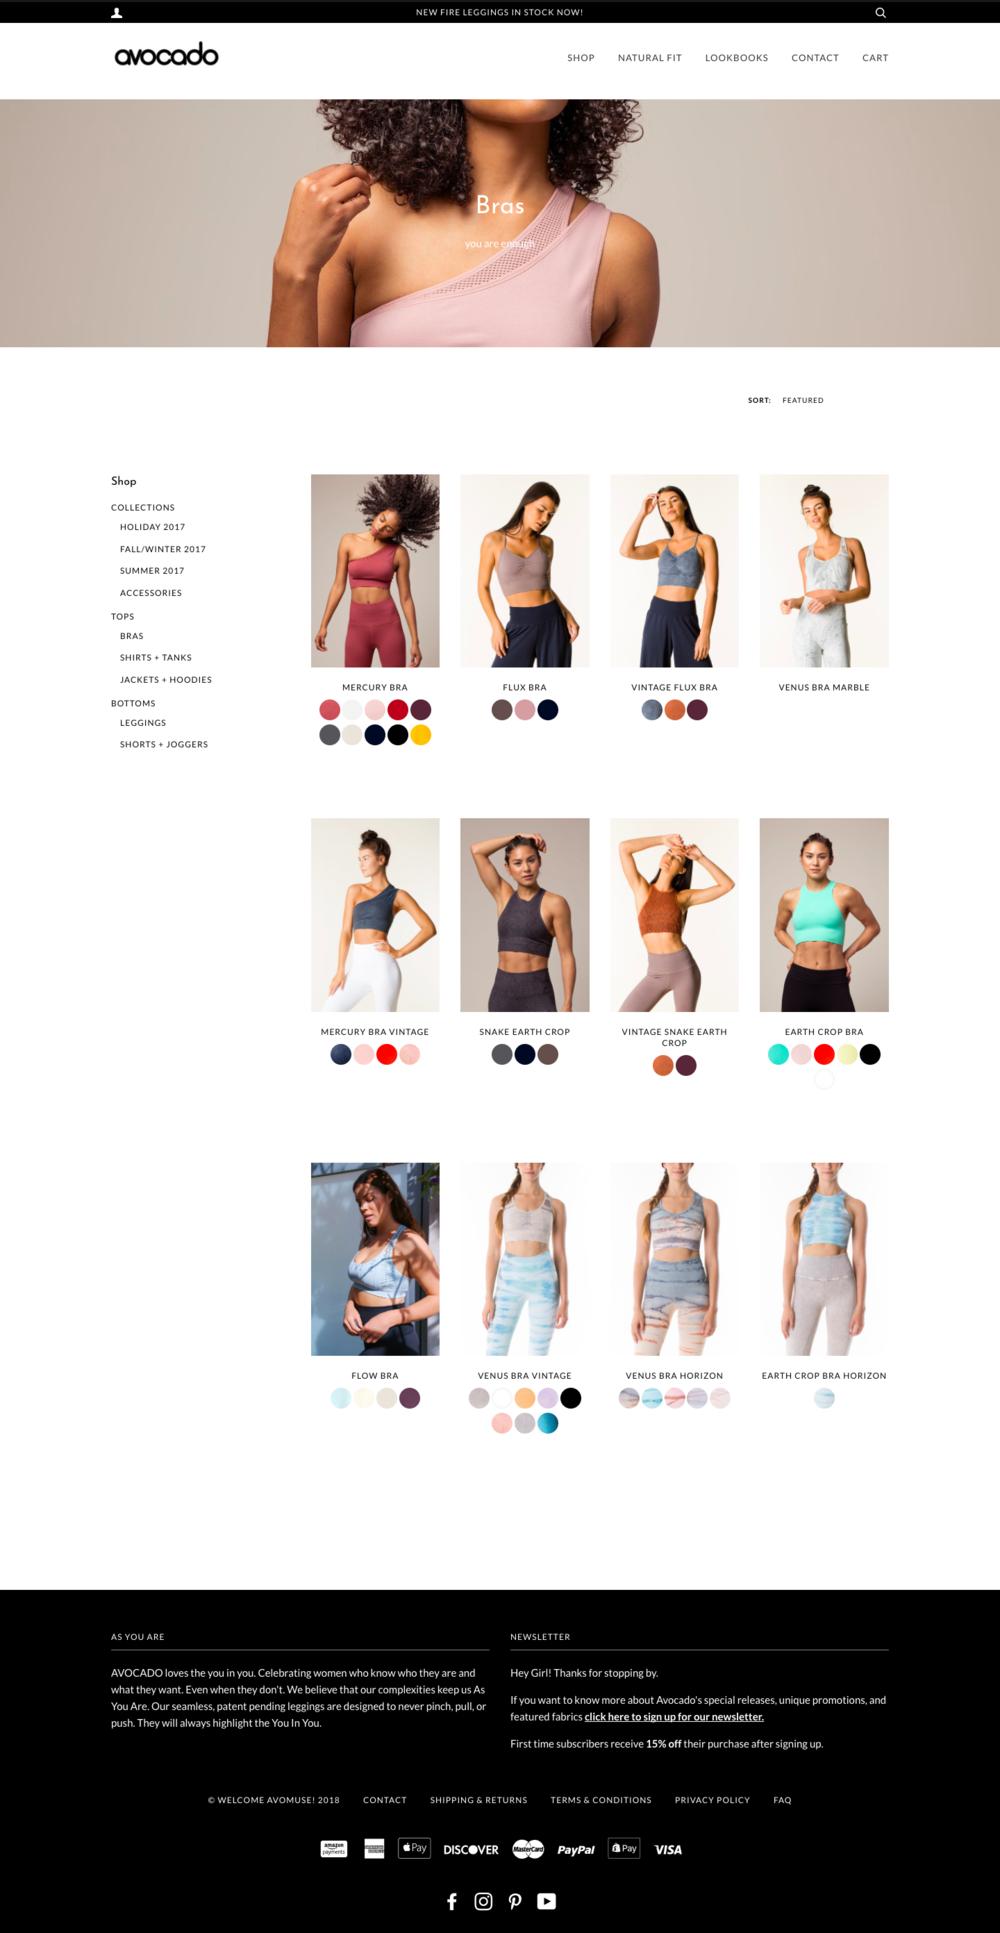 screencapture-shopavocado-collections-bras-1517360163823.png